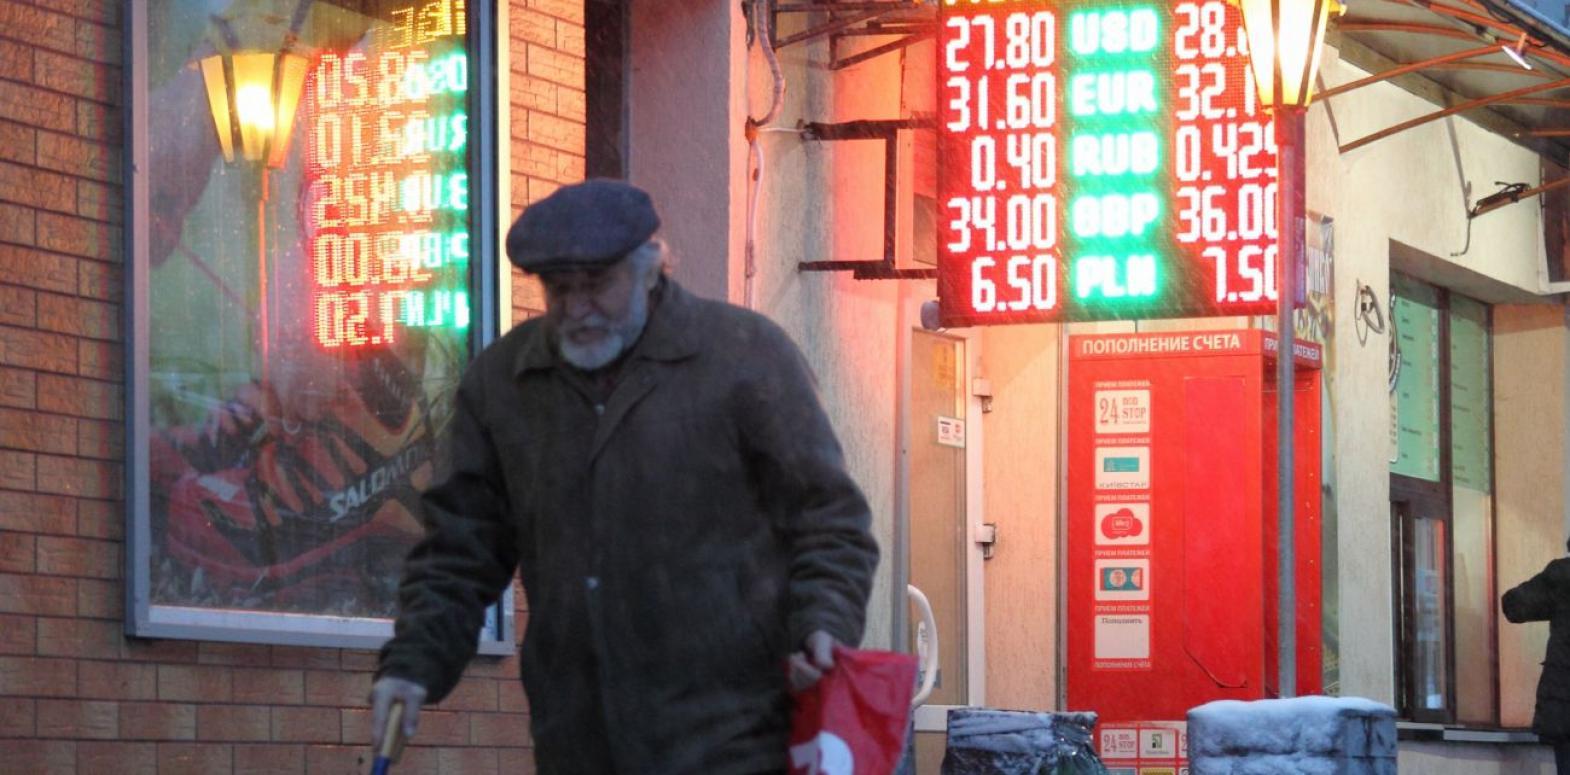 Аналитики прогнозируют рост курса до 27,50 грн/доллар после отставки Смолия